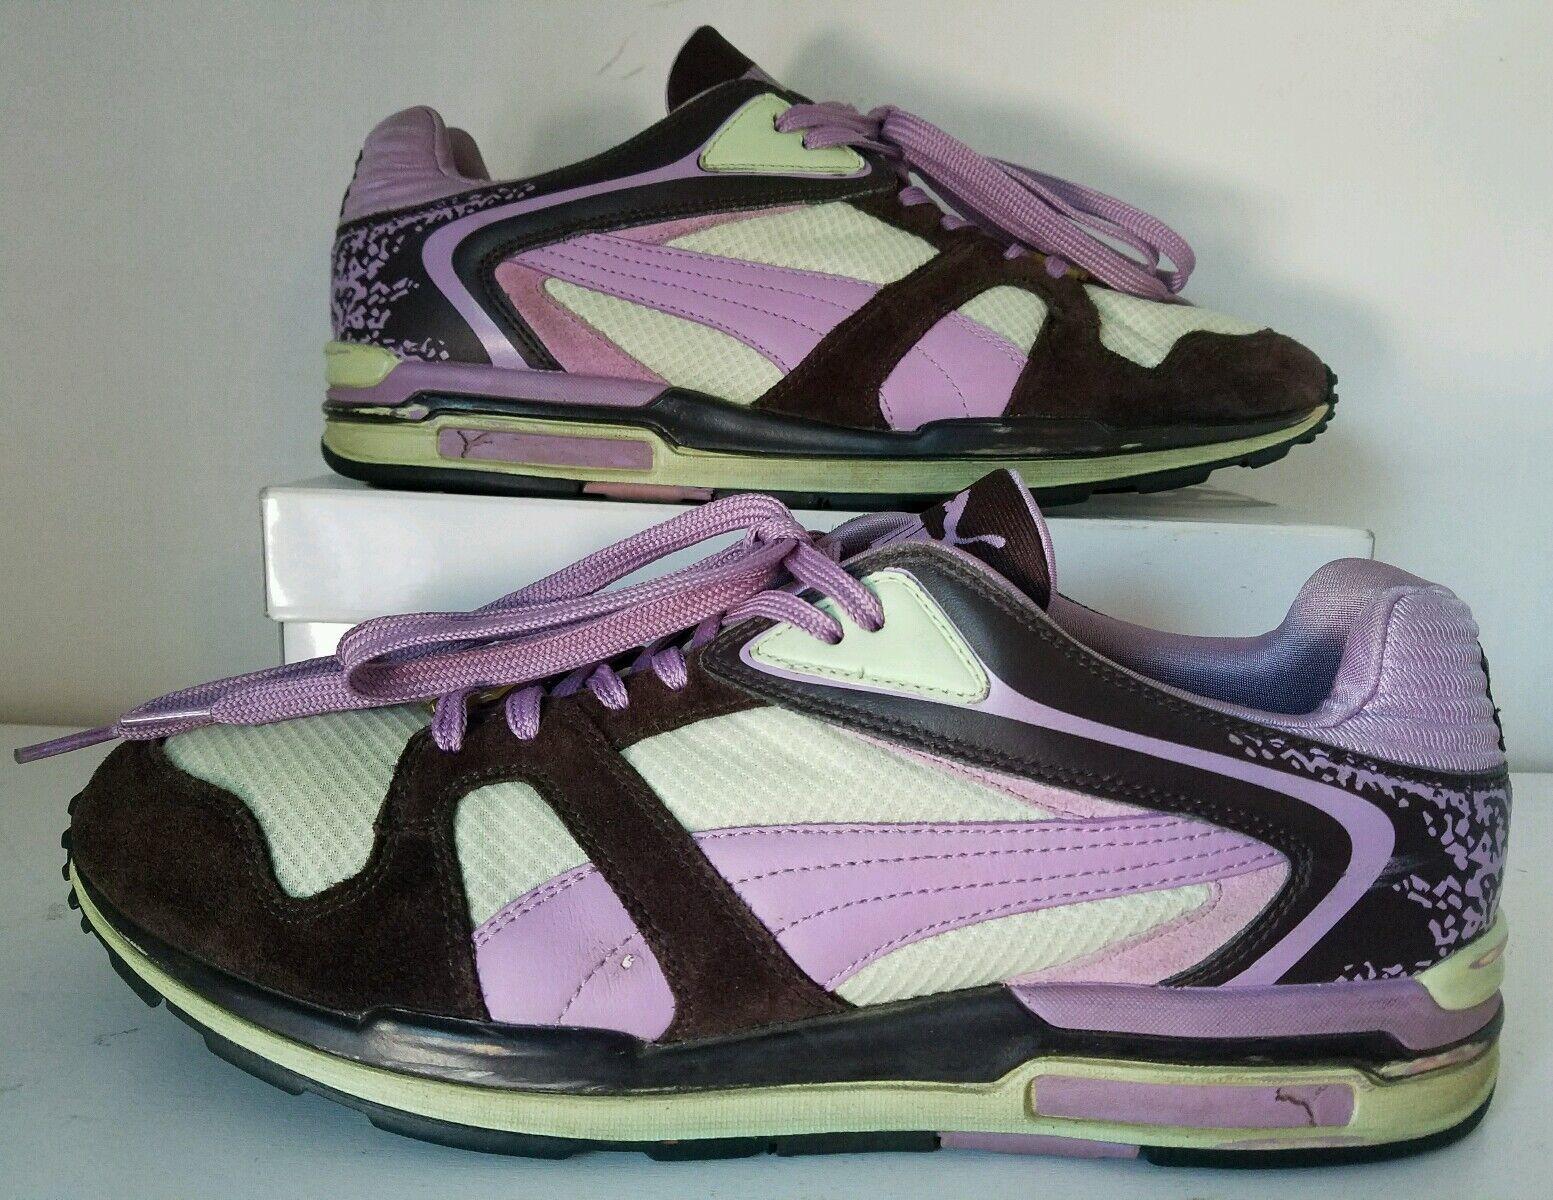 Rare Vintage SAMPLE  Puma Running Chaussures  Violet ,Marron & Vert Sz 9.5 US